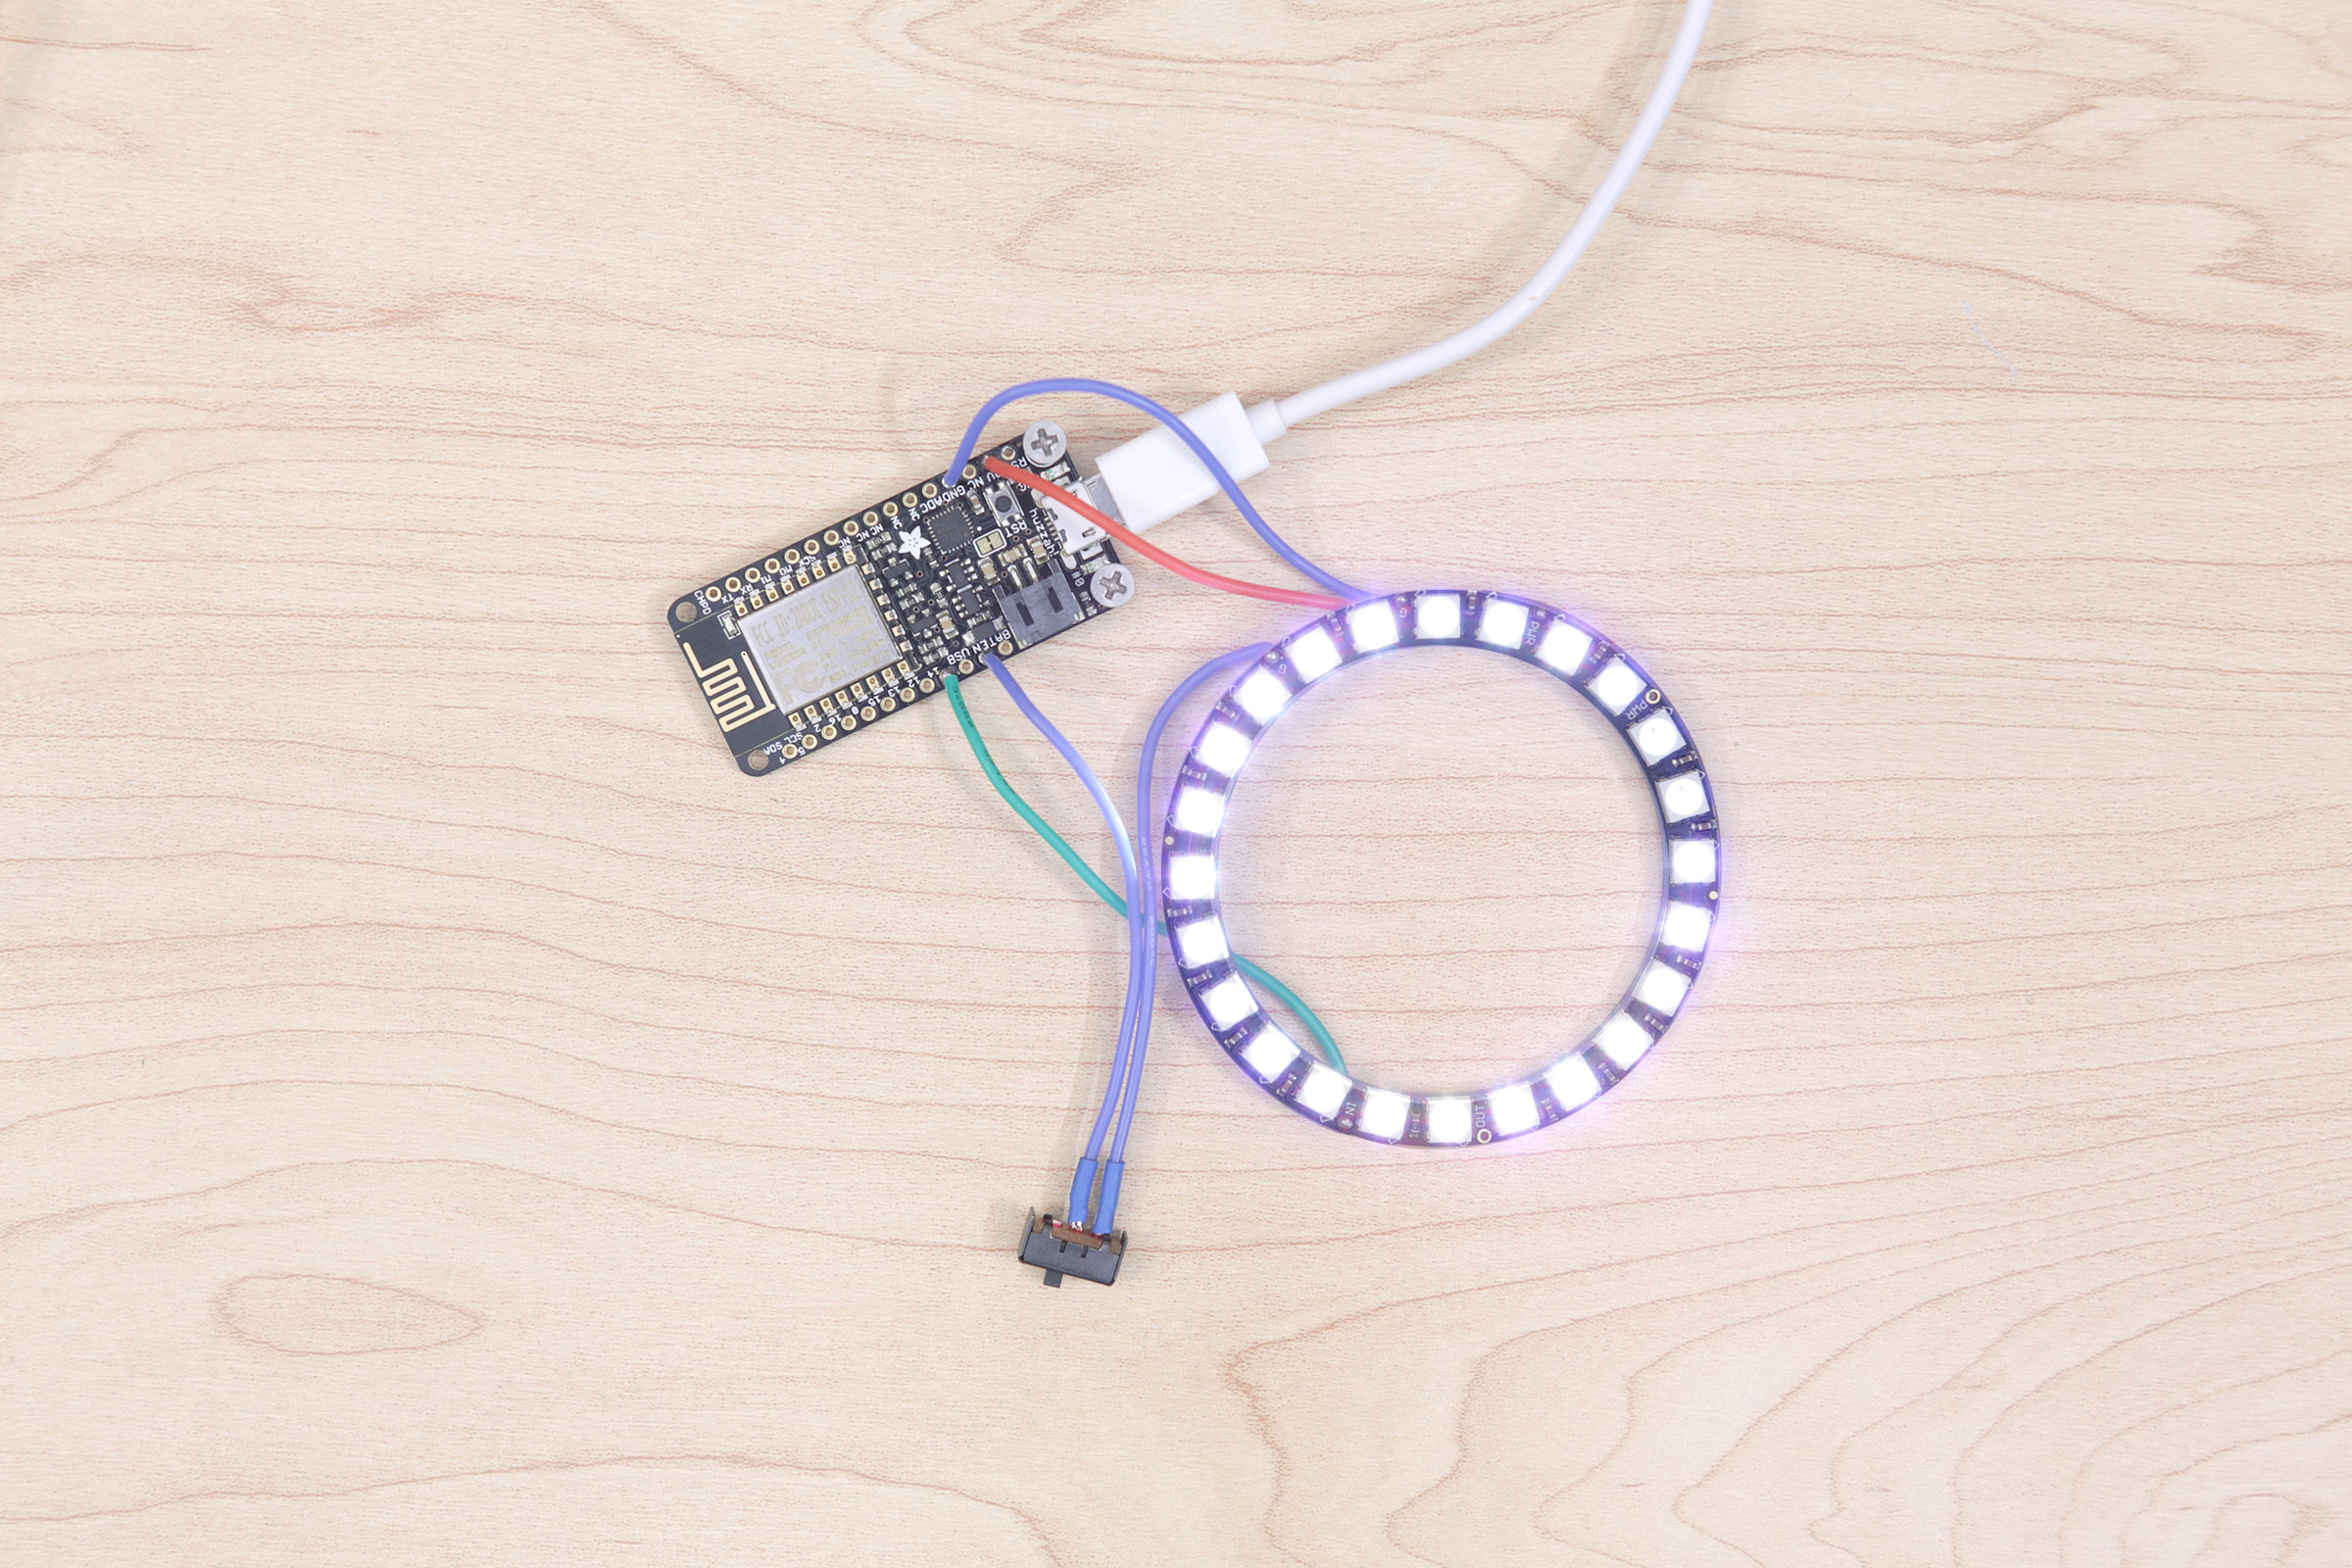 circuit-test